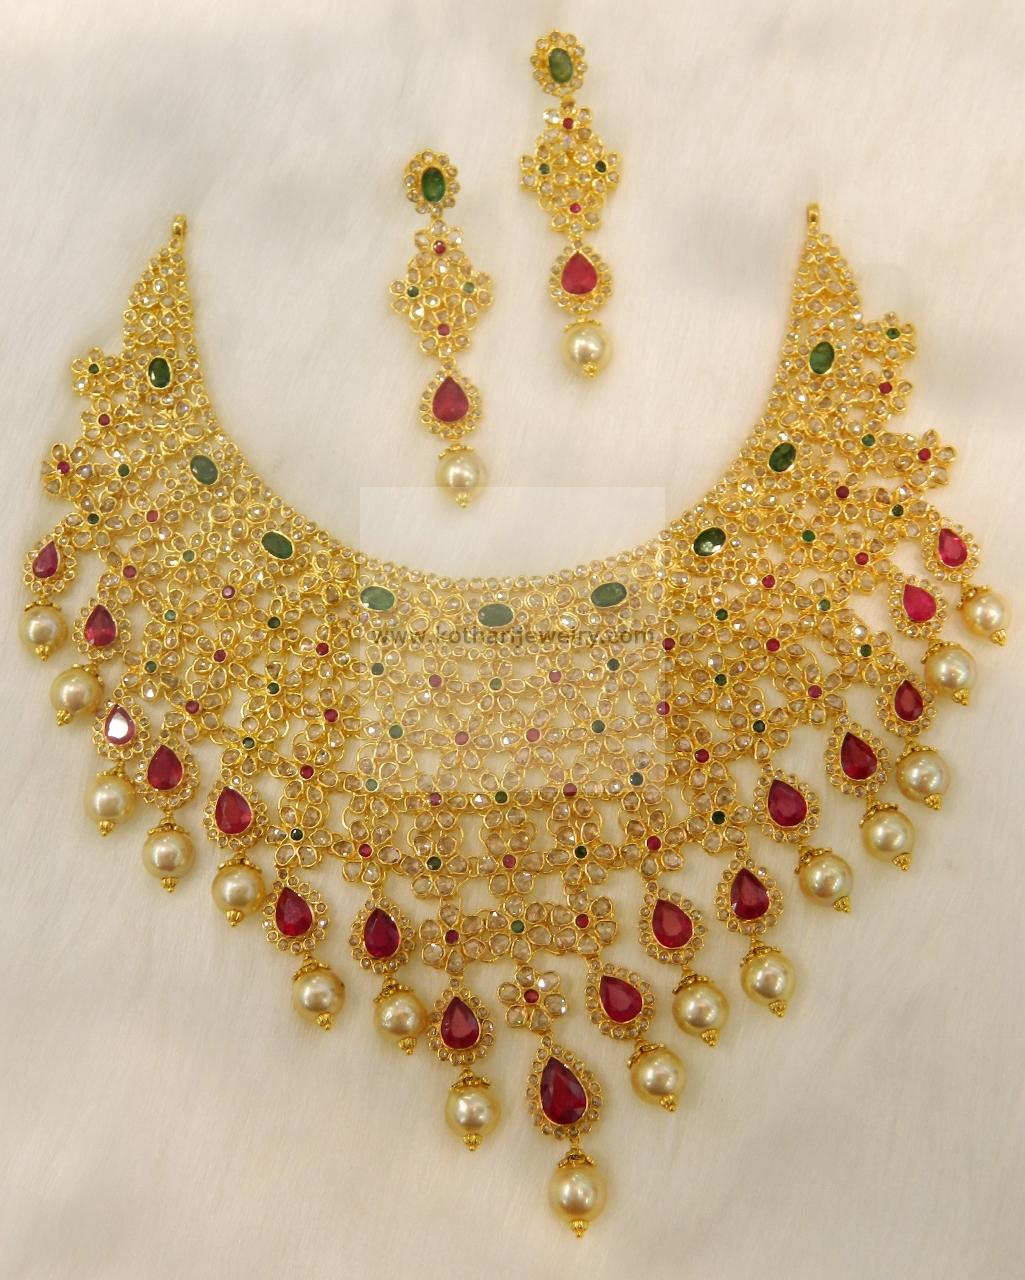 22kt Uncut Diamond Choker Necklace Set